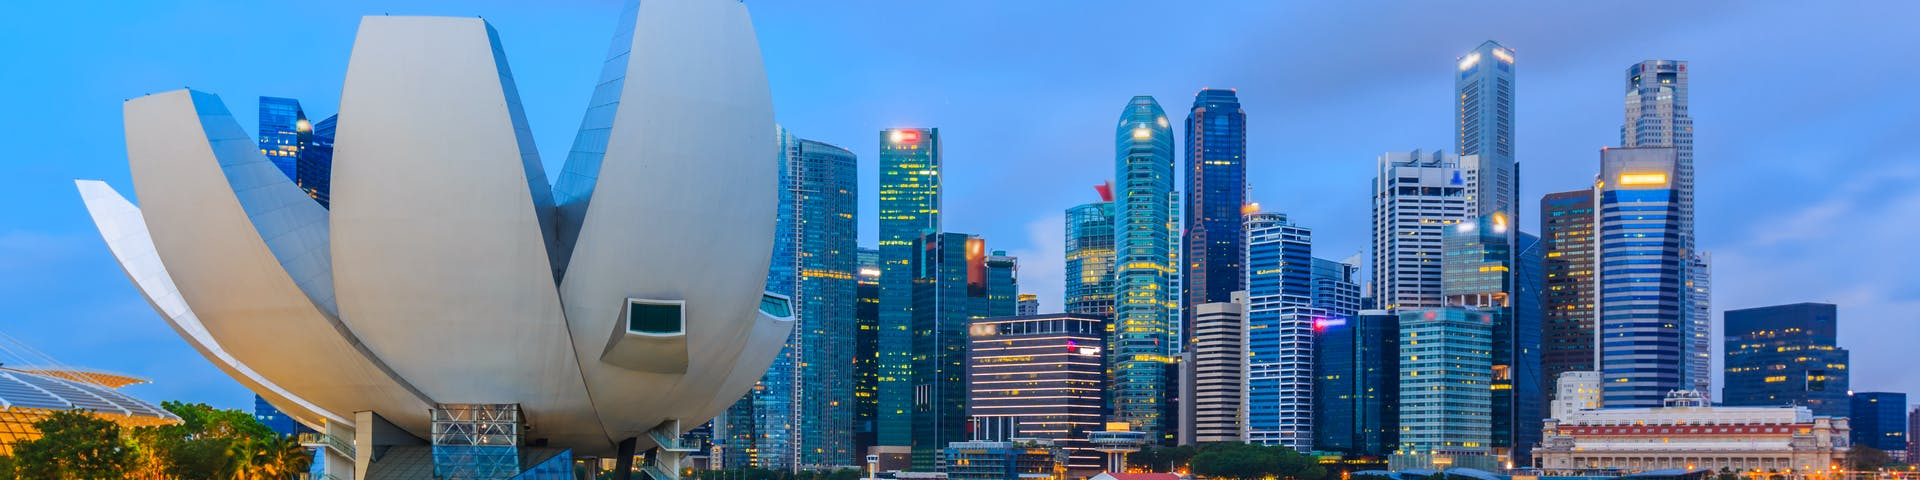 Masters in Singapore - MastersPortal com